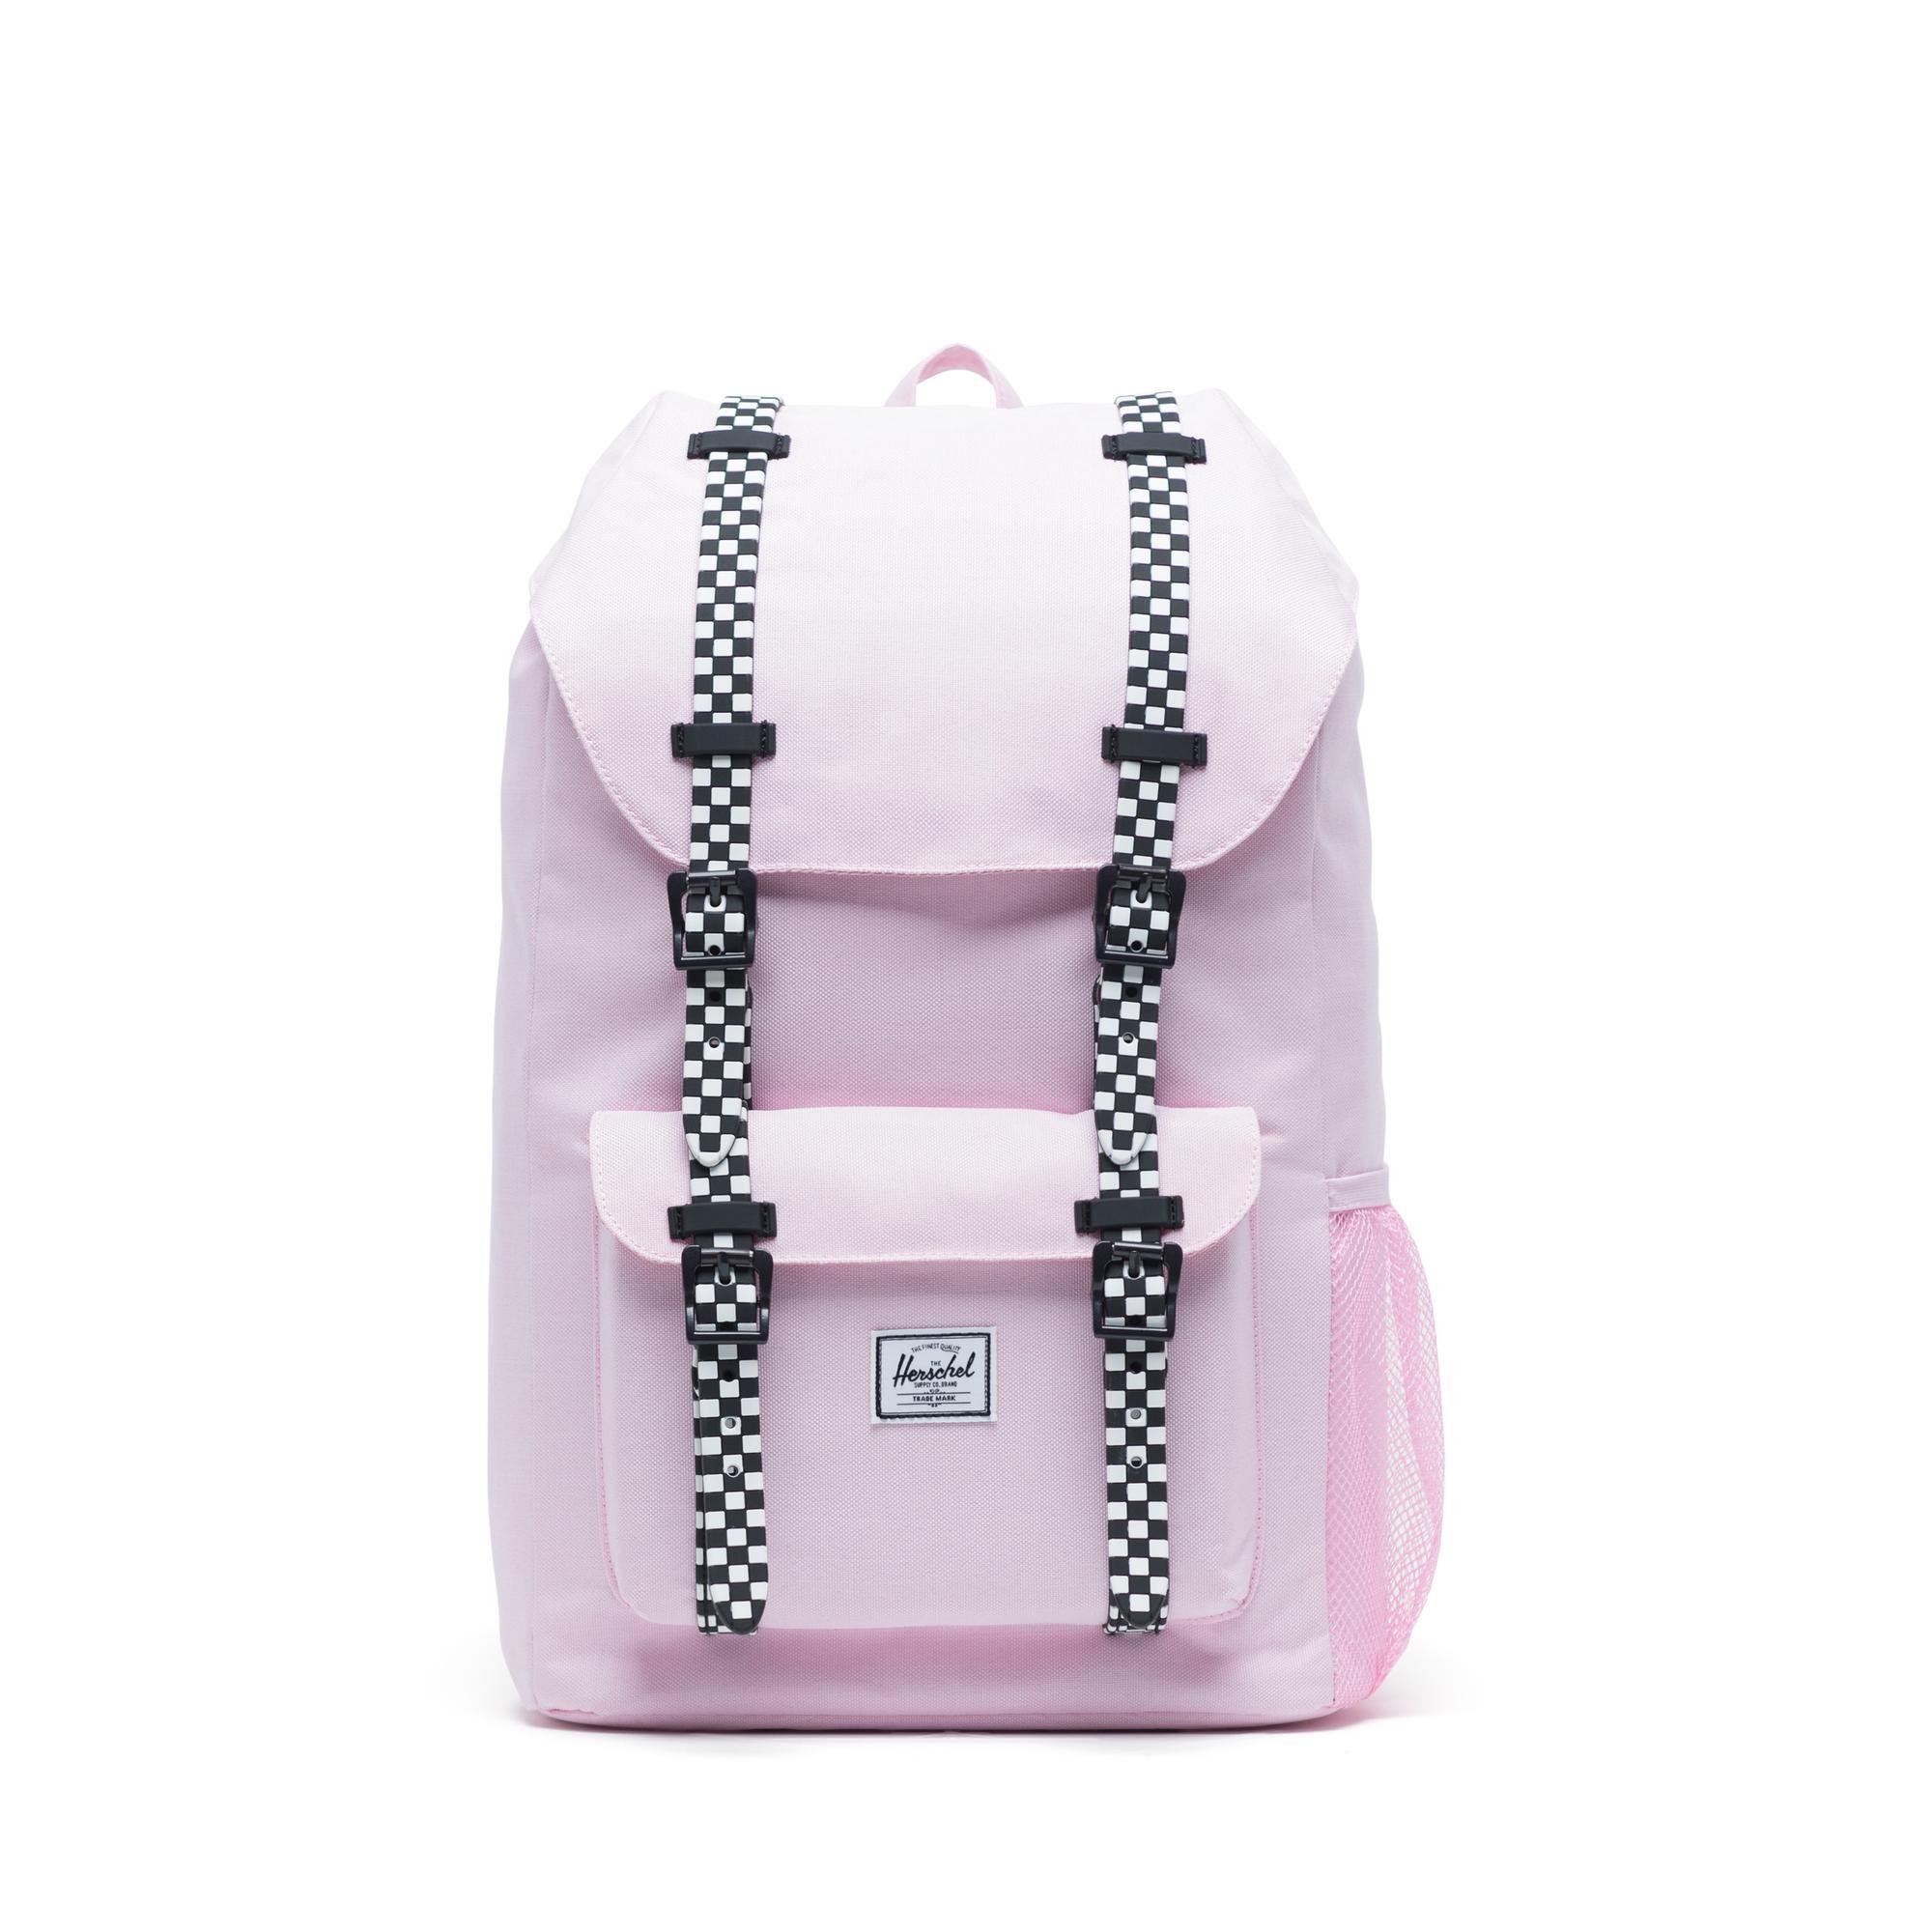 8f94897408e90 Herschel Little America Backpack Youth